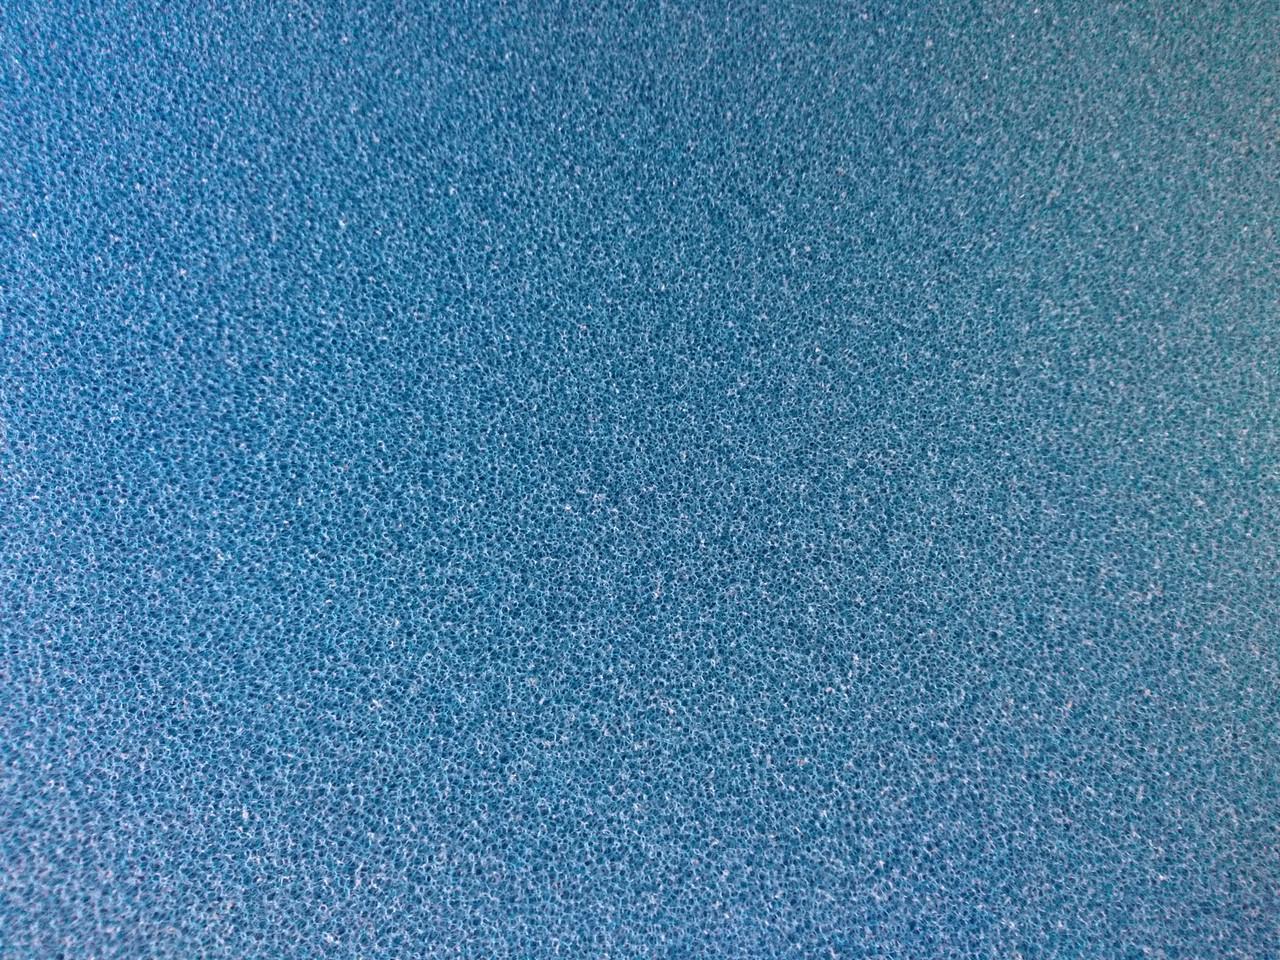 Мочалка синяя, лист (50*50*2)см, среднепористая